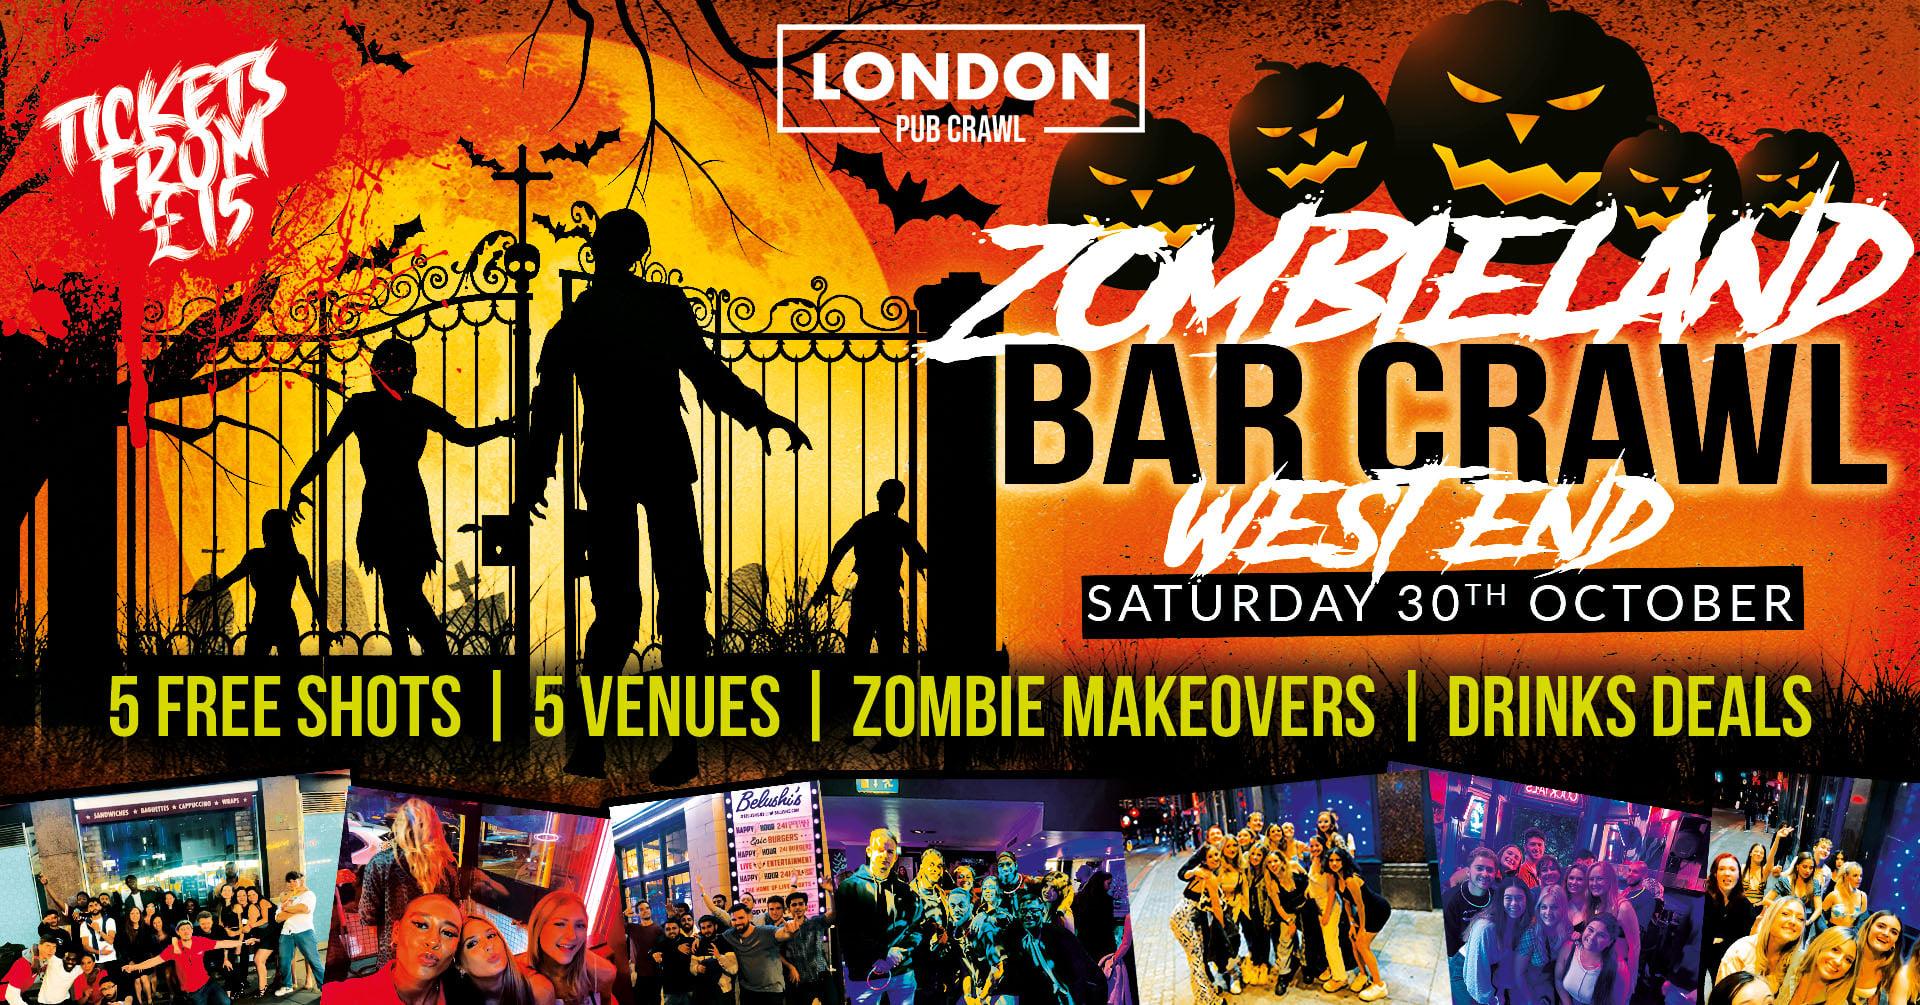 West End ZombieLand // LDN's Biggest Halloween Bar Crawl // Free Shots